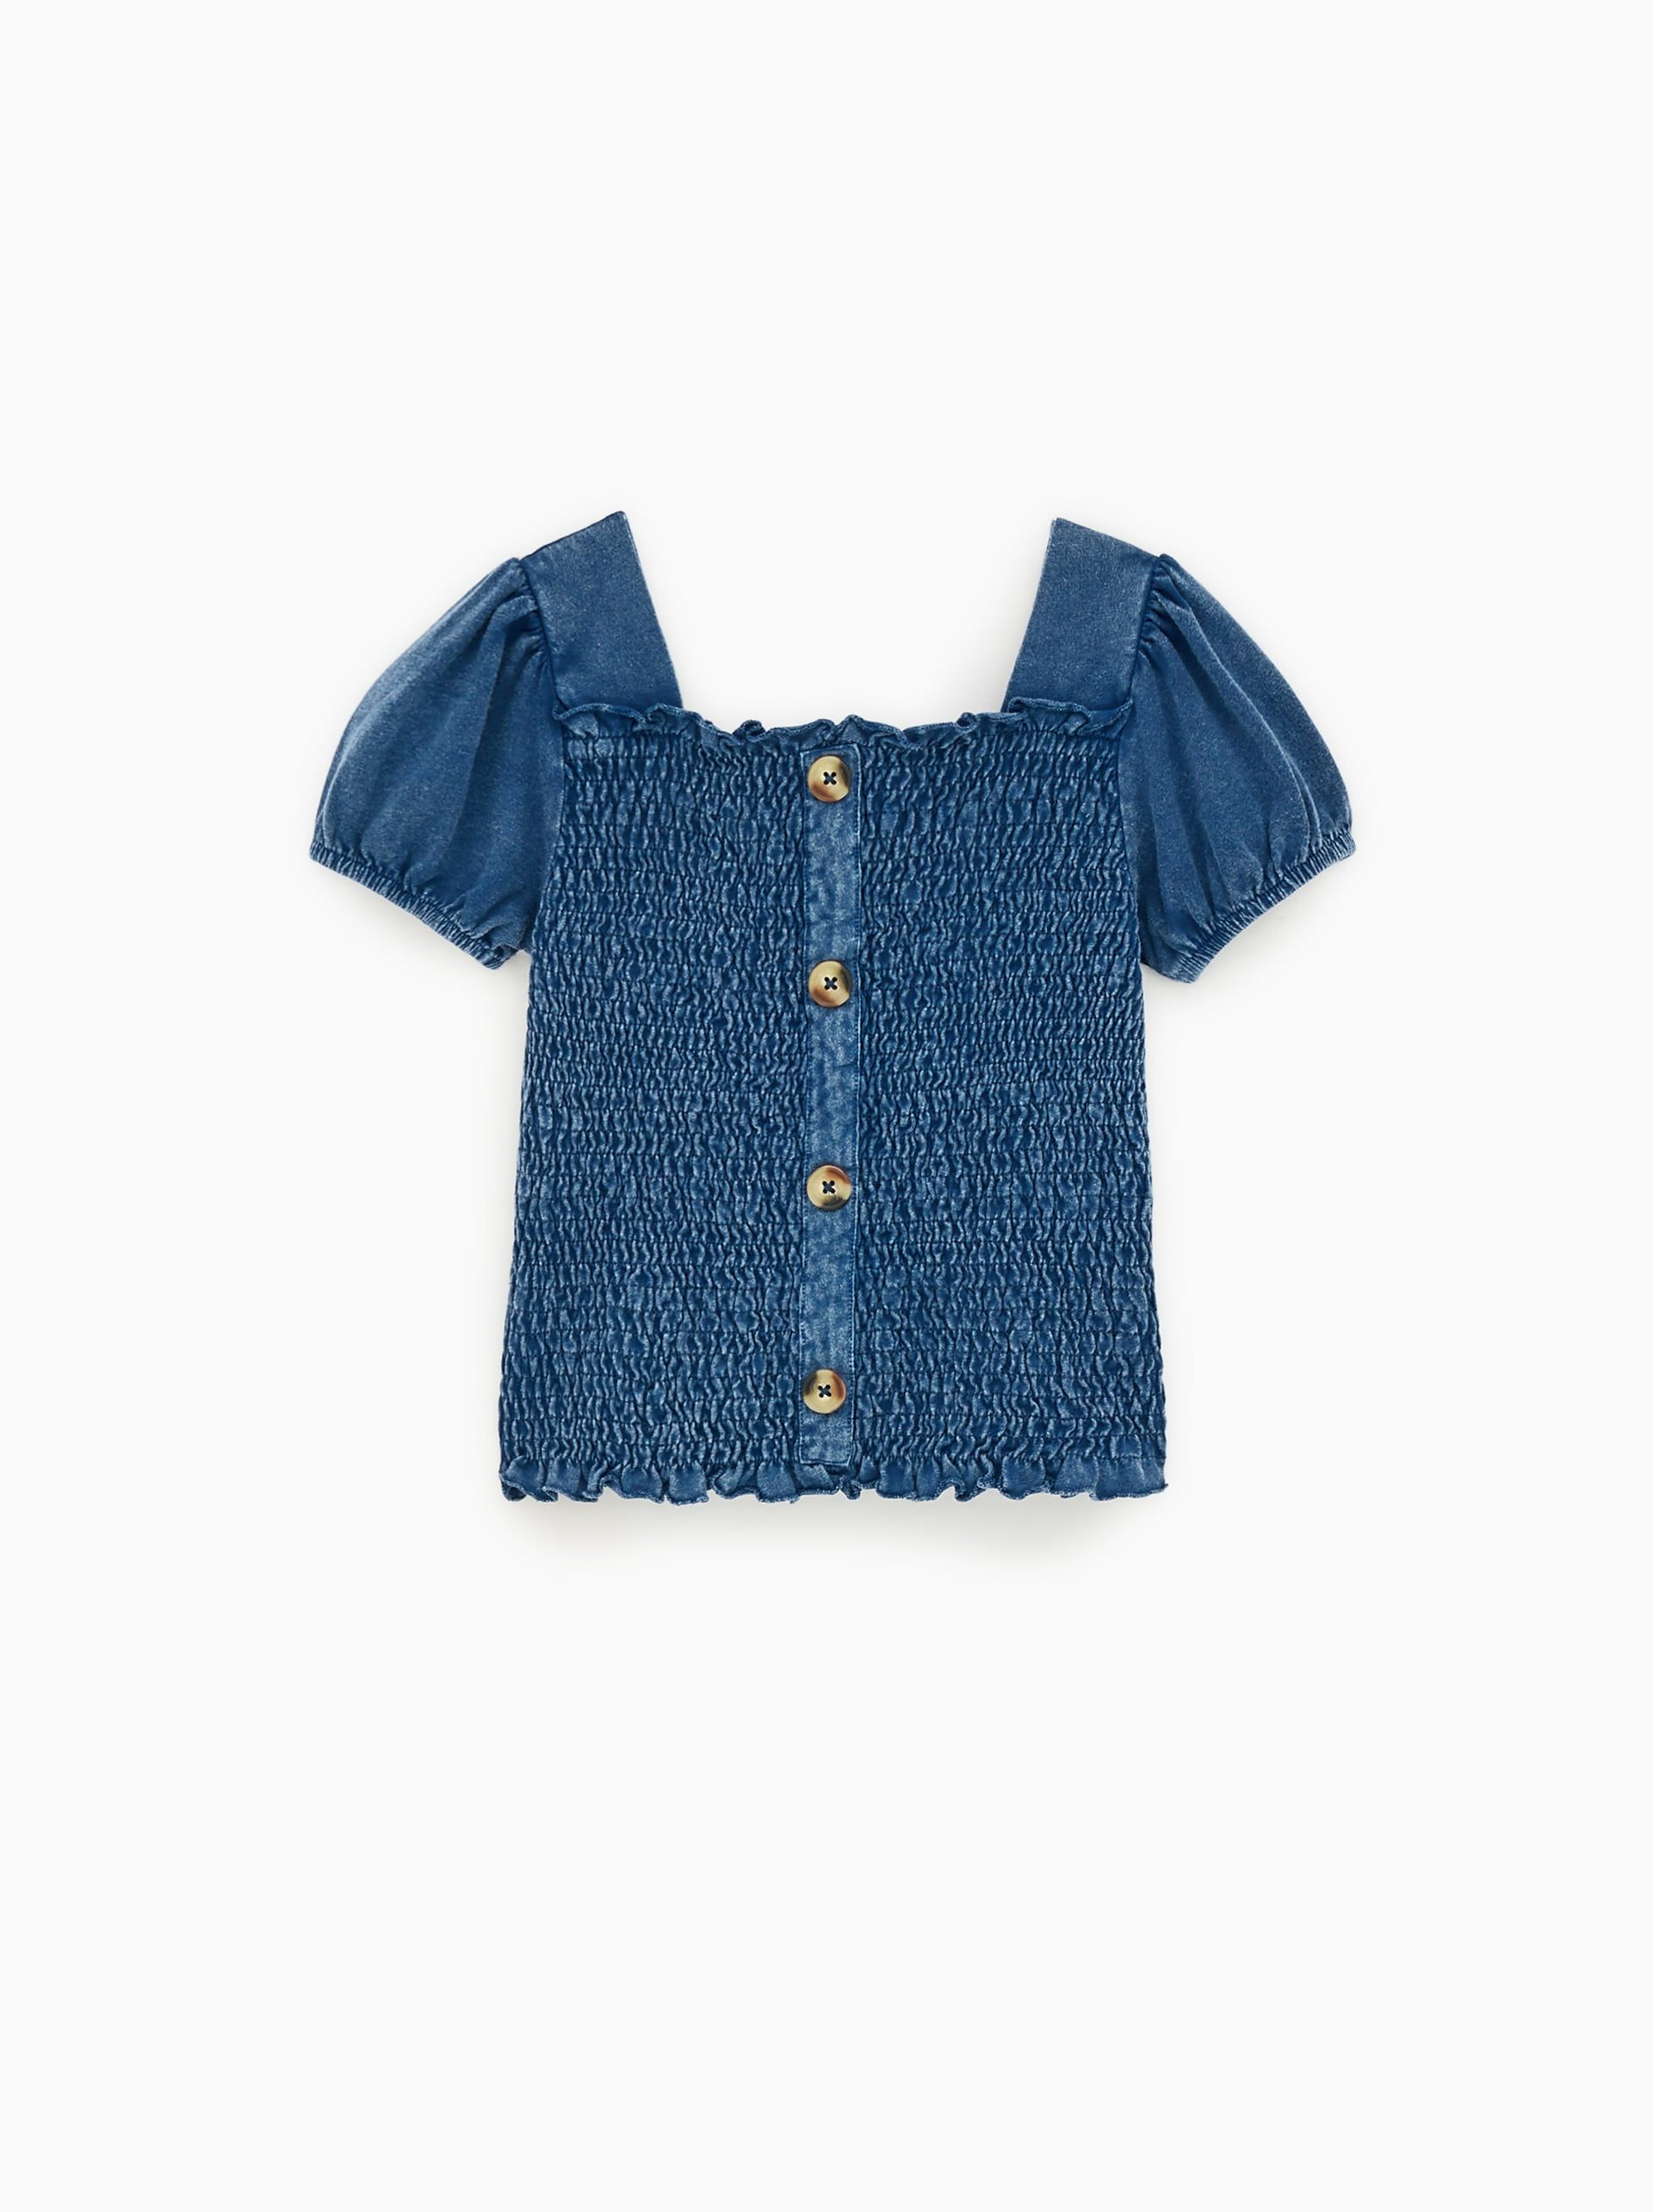 288143b196 Smocked top | Kids ss19 | Smocking, Tie dye jeans, Tie dye sweatshirt